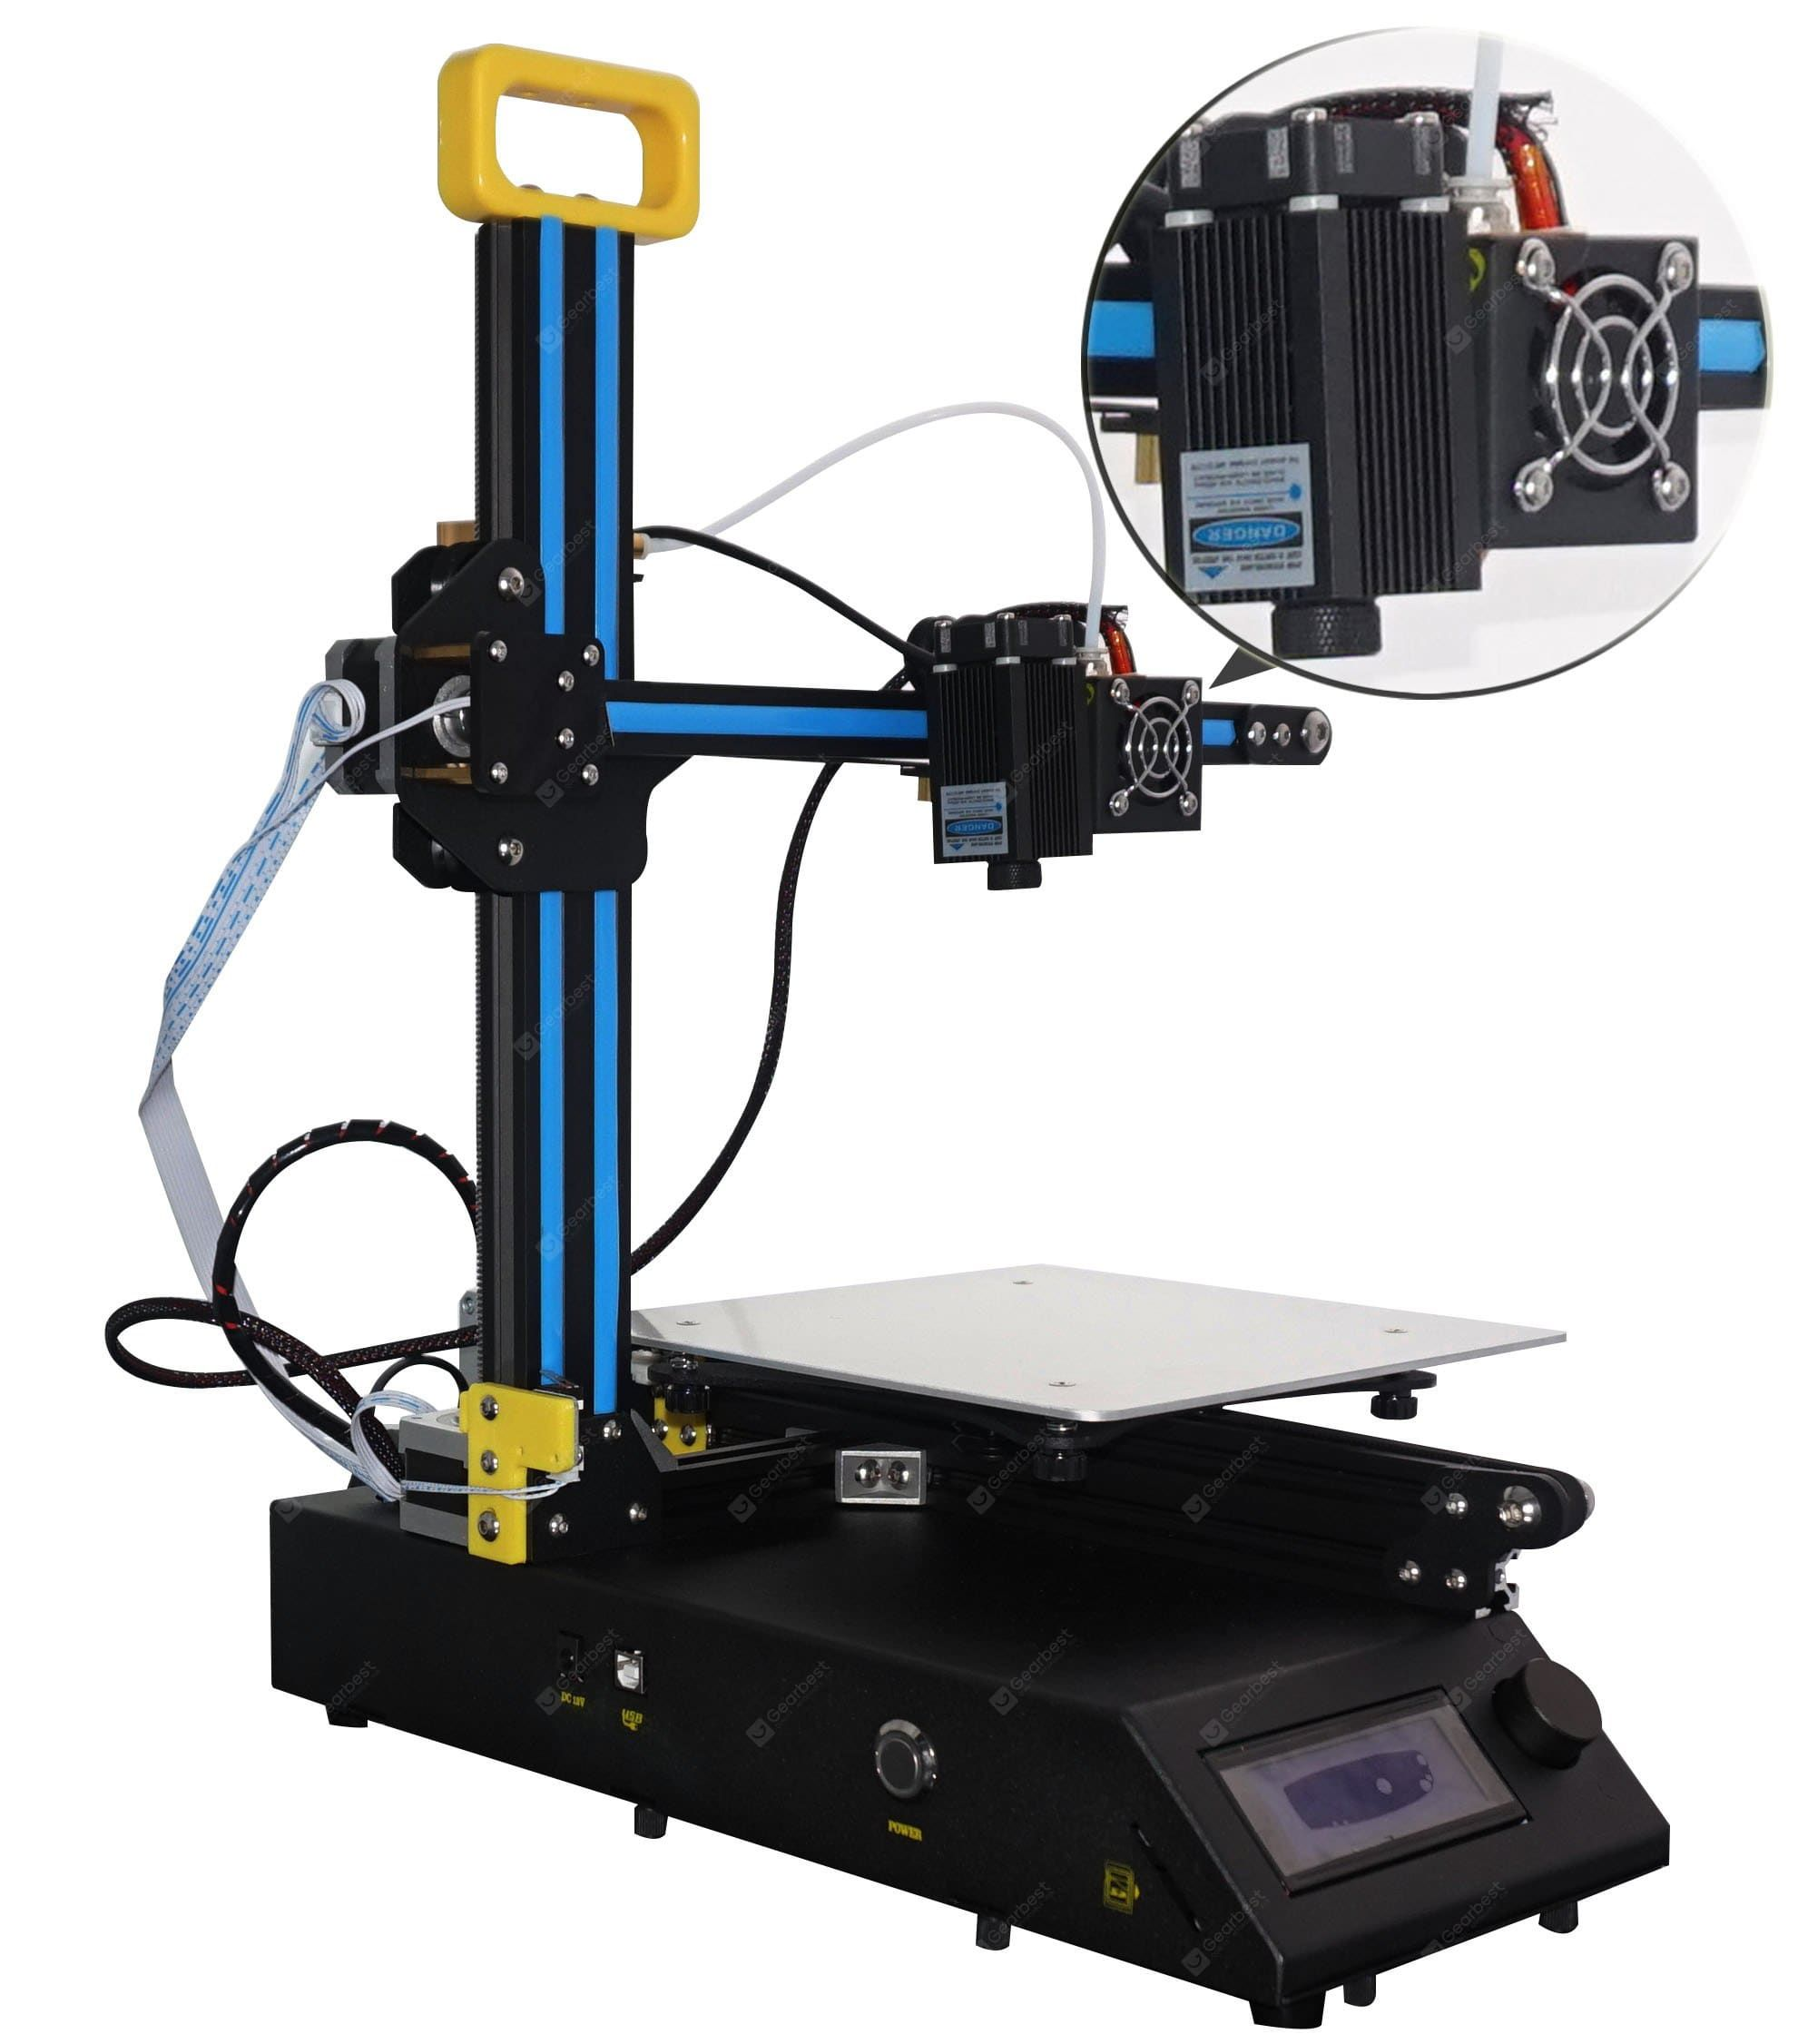 Creality3d Cr 8 2 In 1 Laser Engraving 3d Printer Gearbest Mobile 3d Printer Kit Multifunction Printer Printer